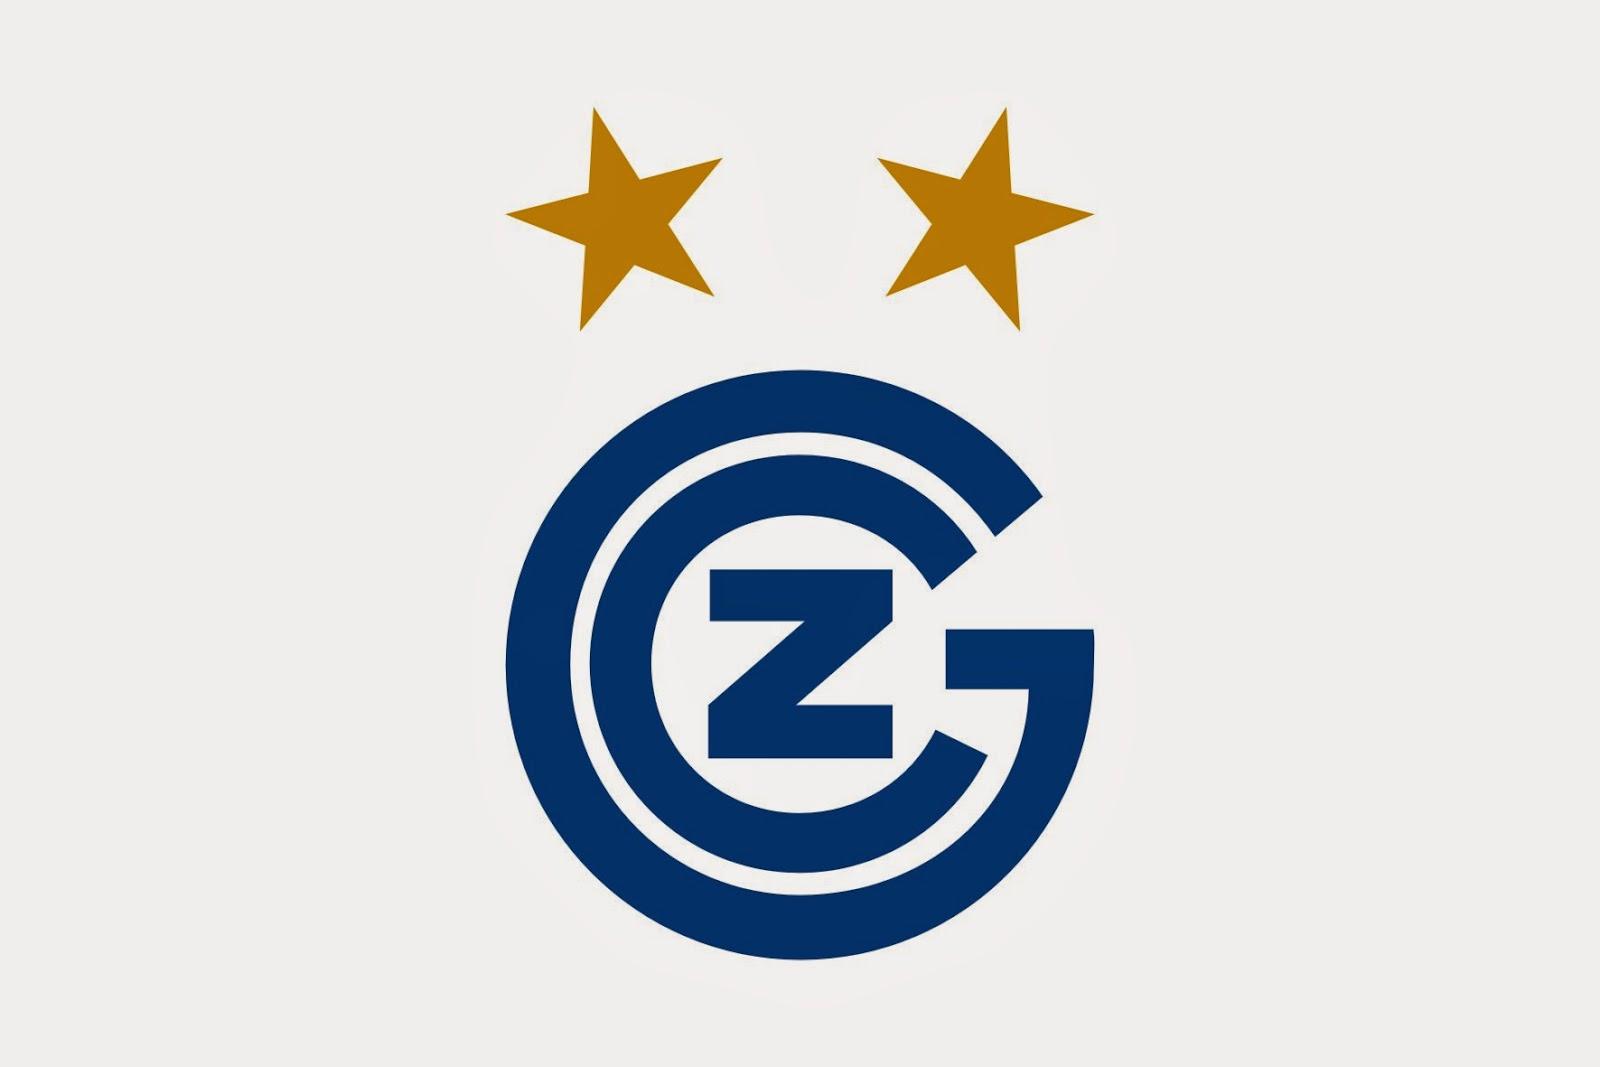 Grasshopper club zurich logo logo share